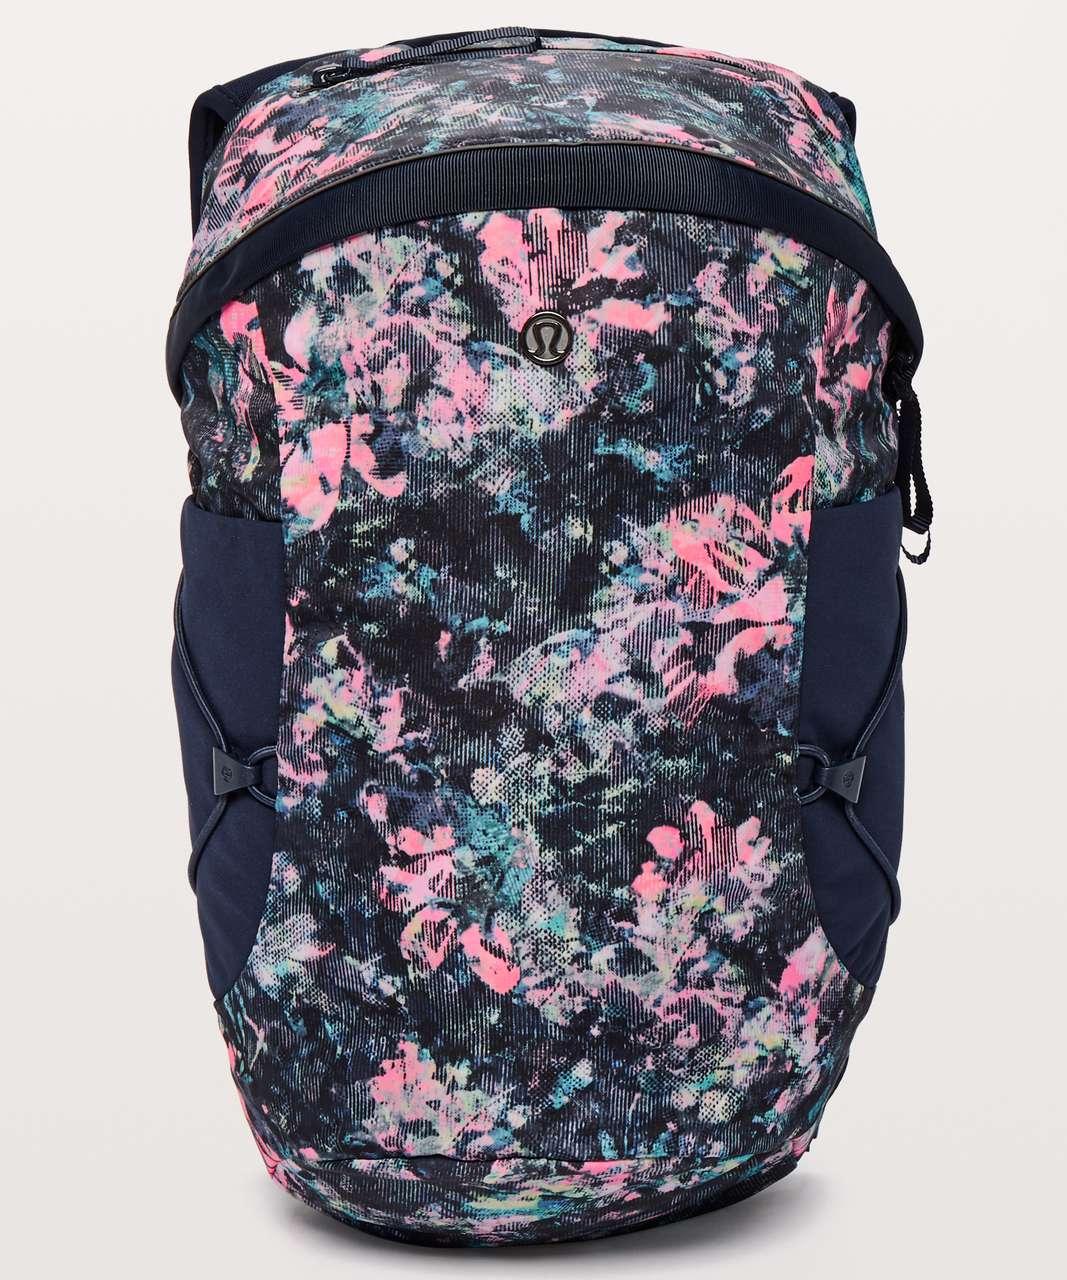 Lululemon Run All Day Backpack II *13L - Dappled Daze Multi / True Navy